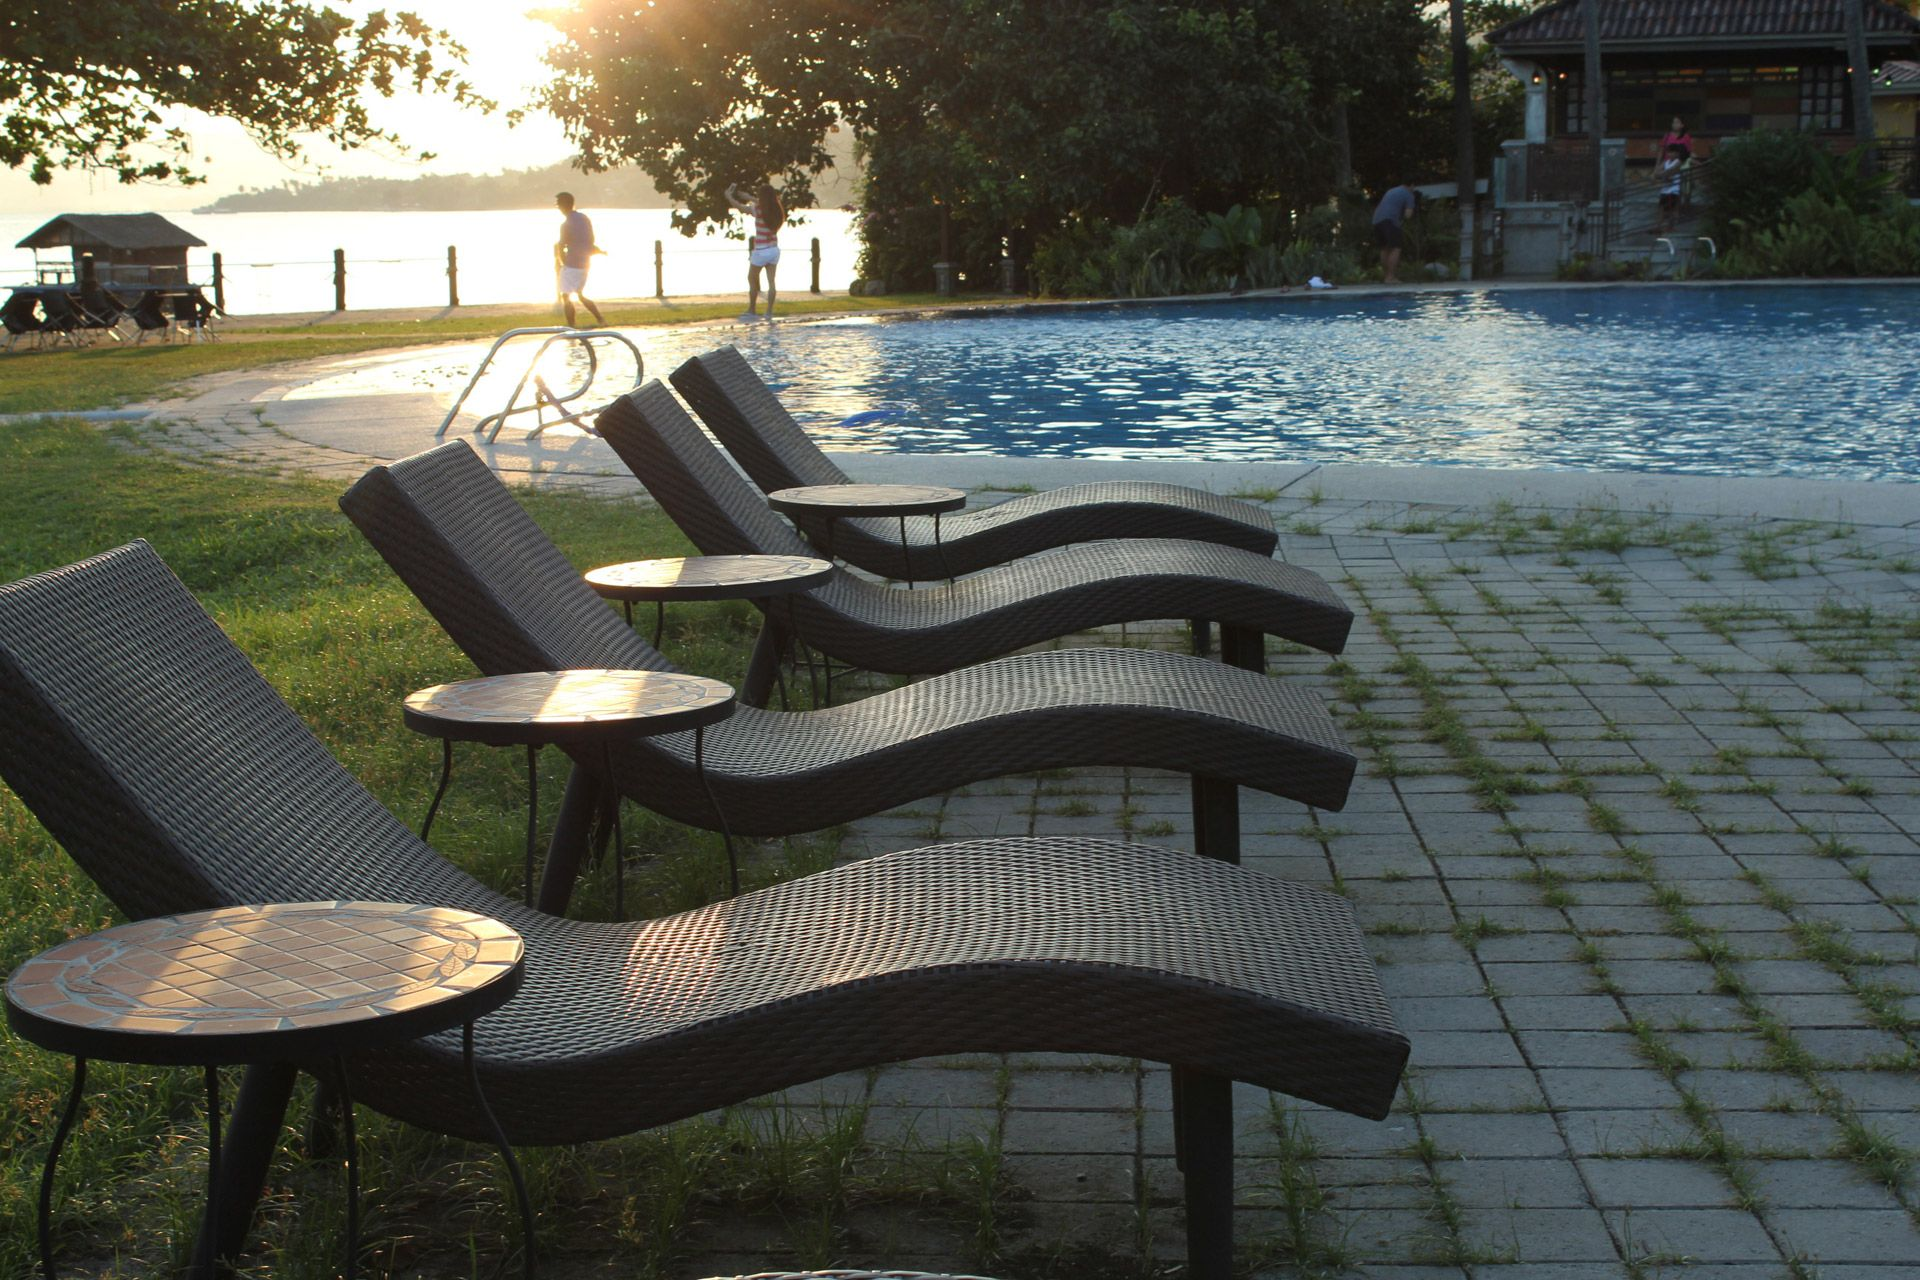 Long Chairs Swimming Pool Wallpaper Free Hd Download High Quality Backyard Pool Designs Swimming Pools Small Backyard Pools Download wallpaper swimming pool on